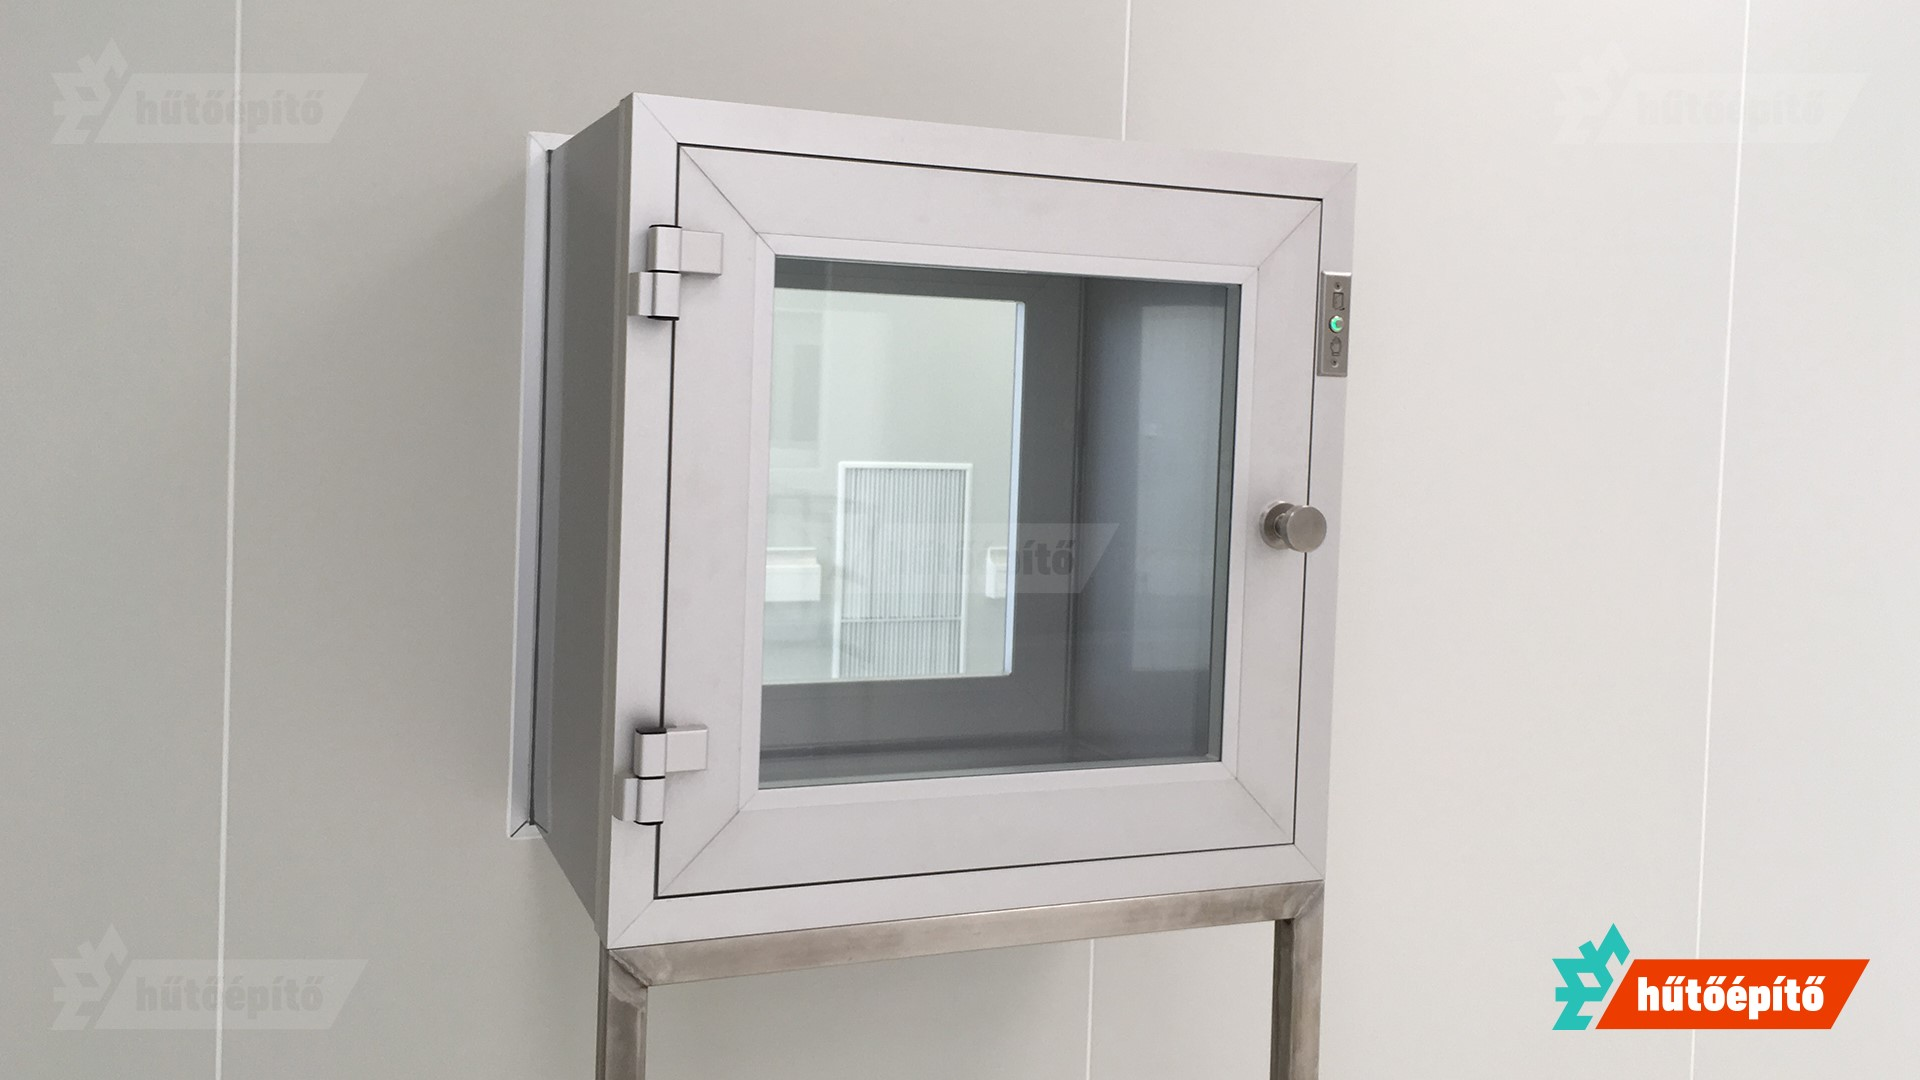 hutoepito kleanlabs tisztateri anyagatadok ISO14644 atado szekreny